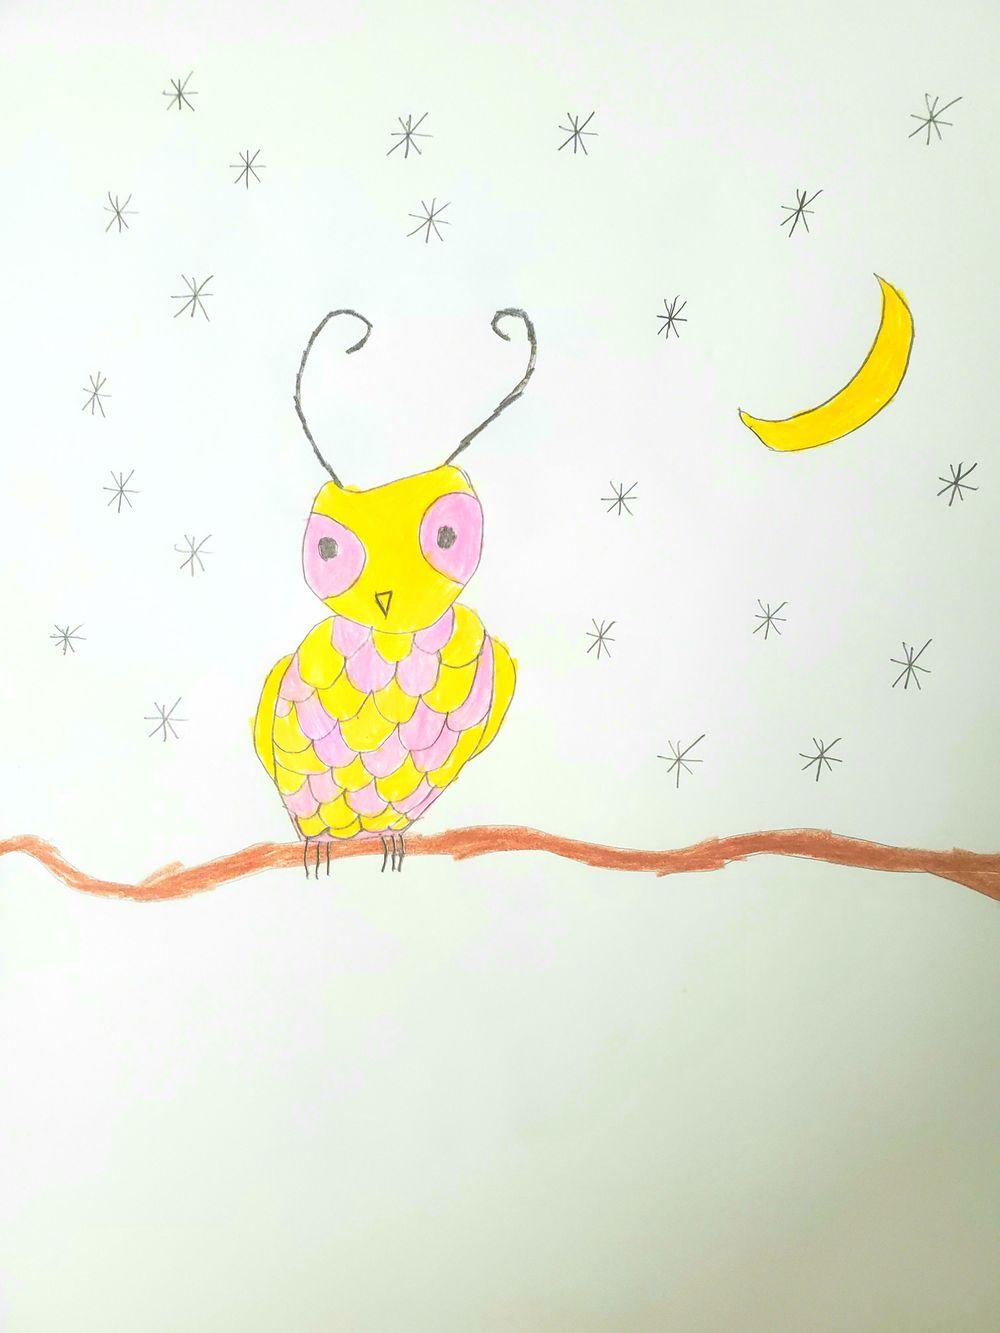 Desert Owl by Jordan - image 1 - student project